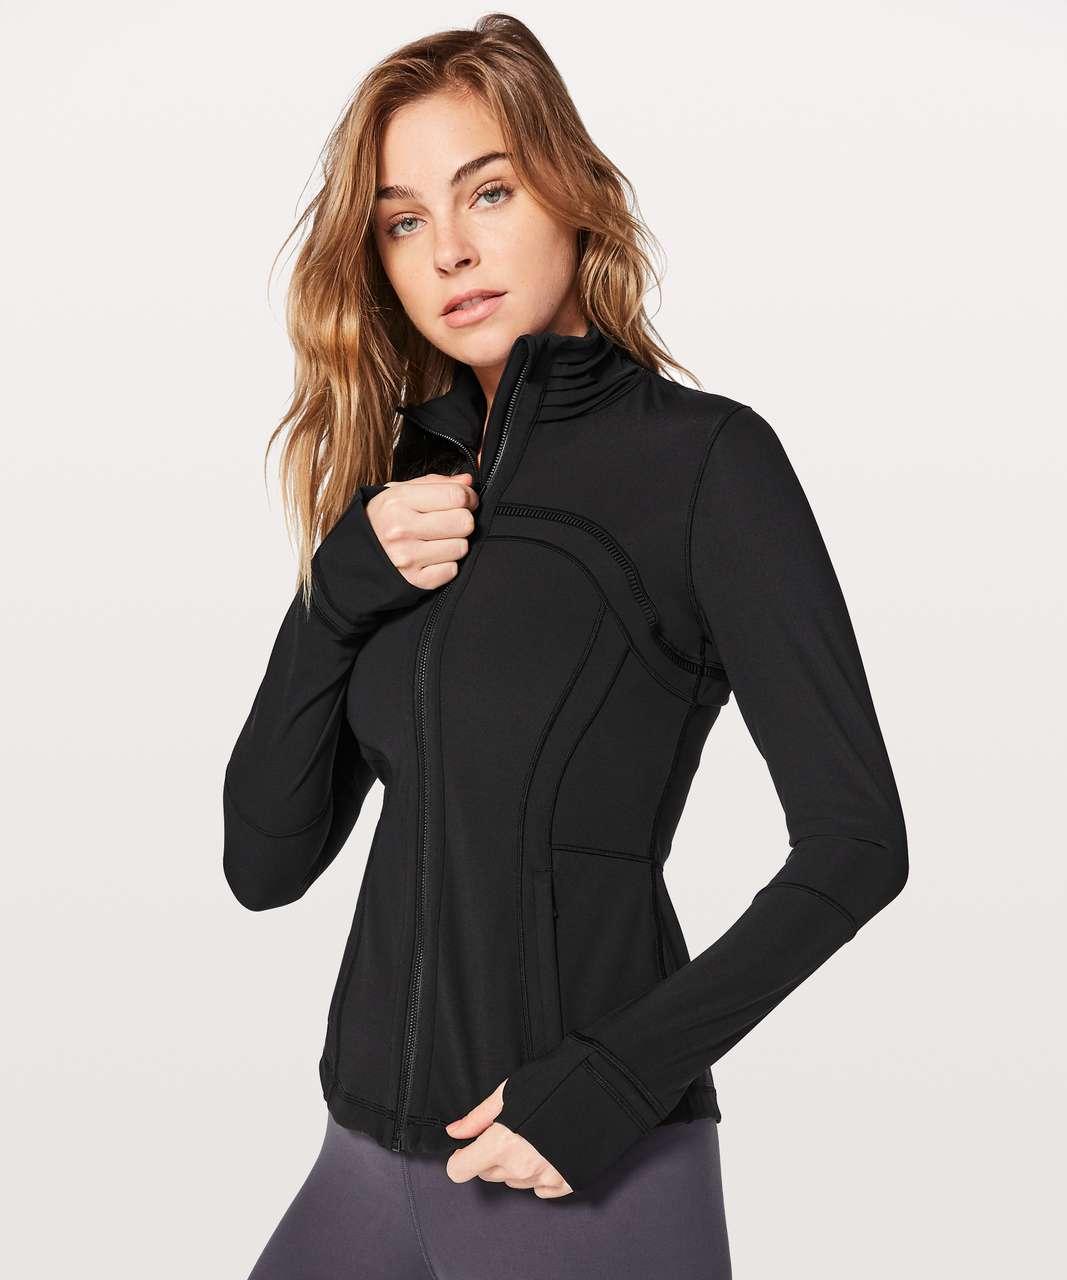 Lululemon Define Jacket Special Edition - Black